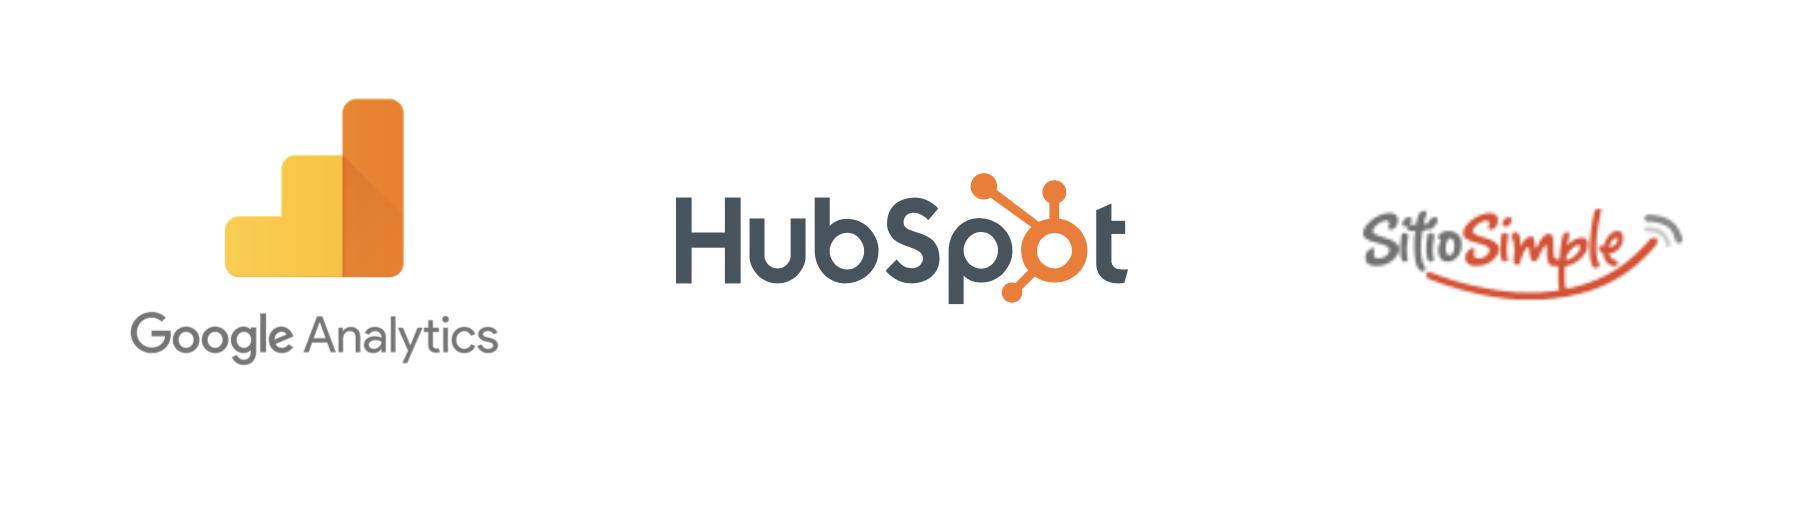 logo analytics logo hubspot logo sitiosimple